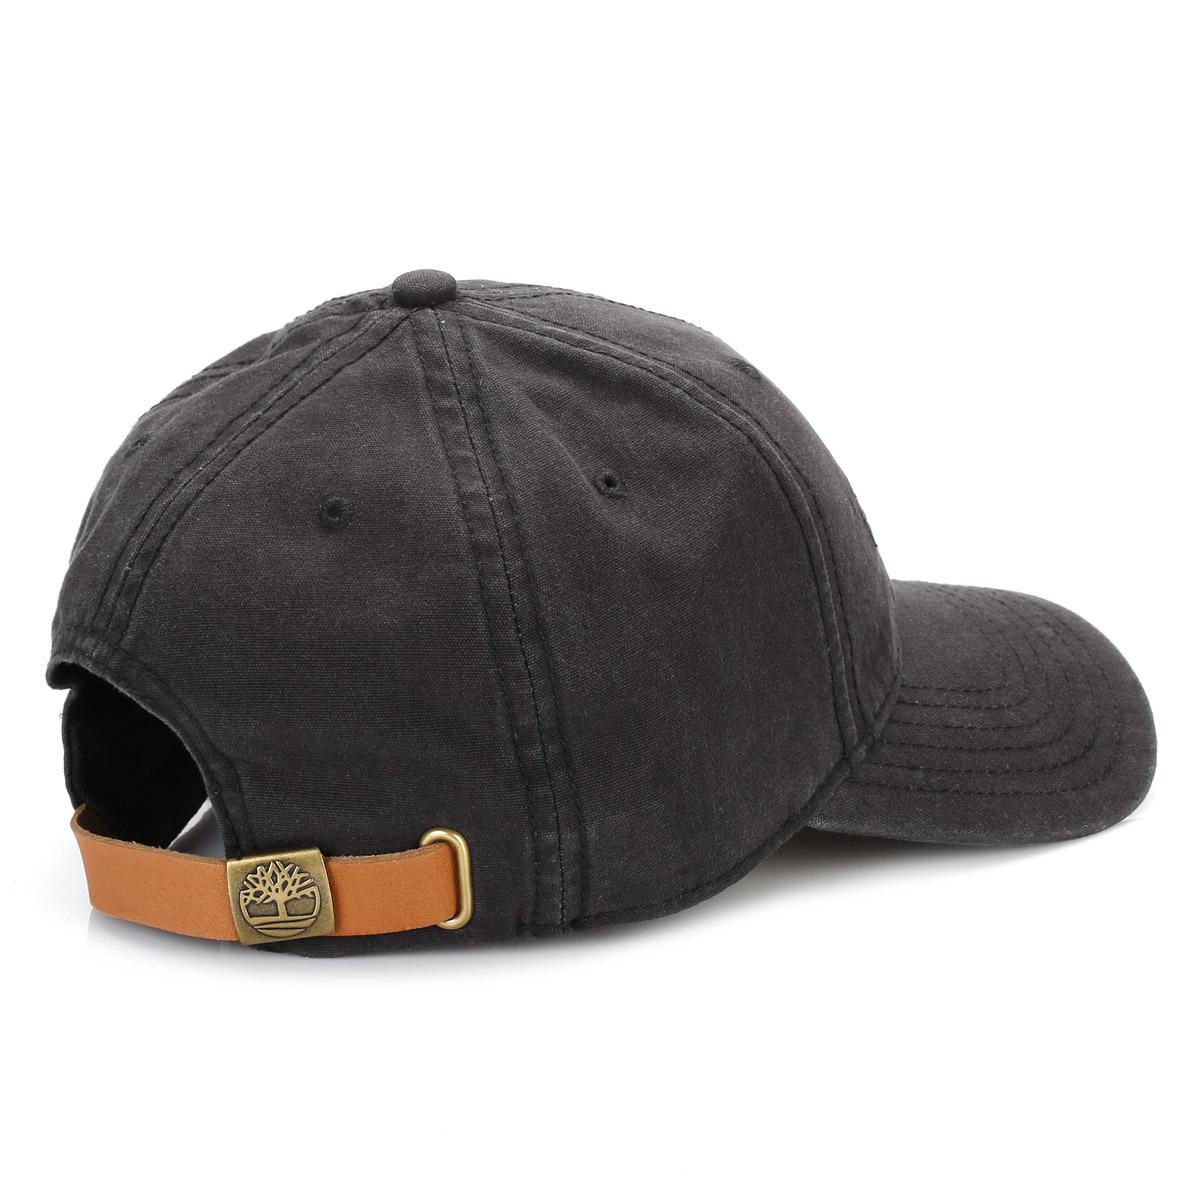 e6e4ec2f32a Timberland Black 6 Panel Baseball Cap in Black for Men - Lyst